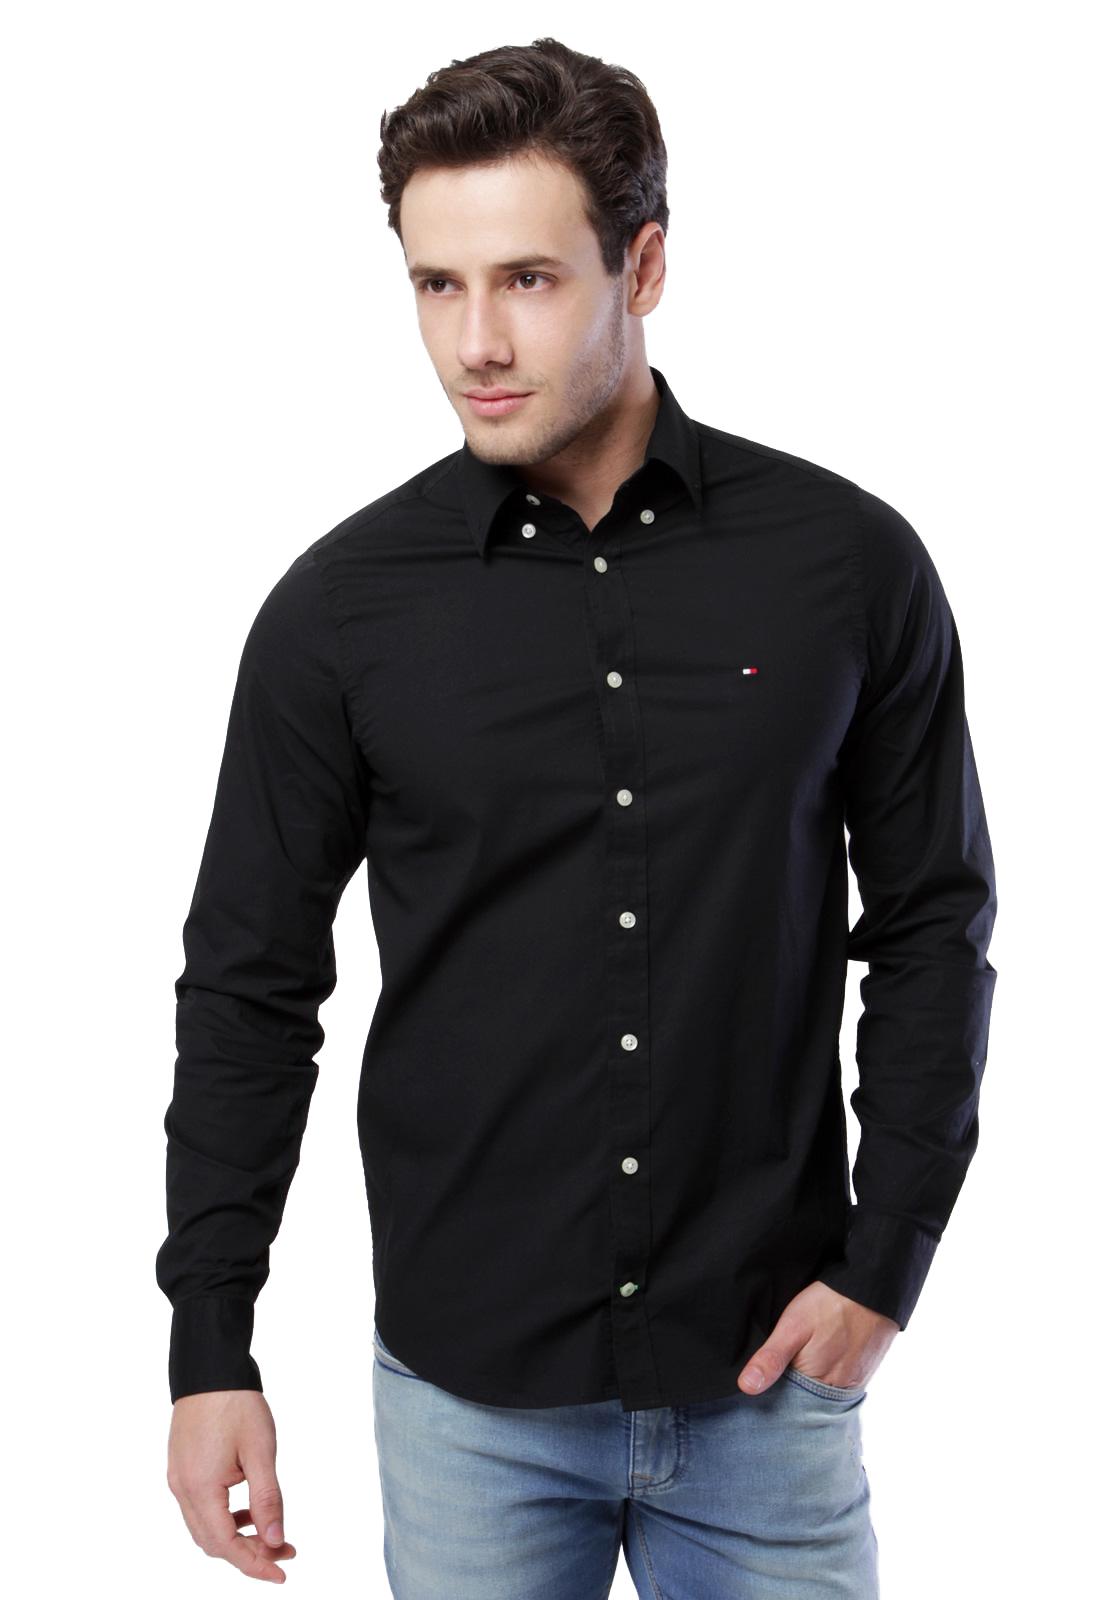 Camisa Tommy Hilfiger Masculina Regular Fit Cotton Oxford Preto